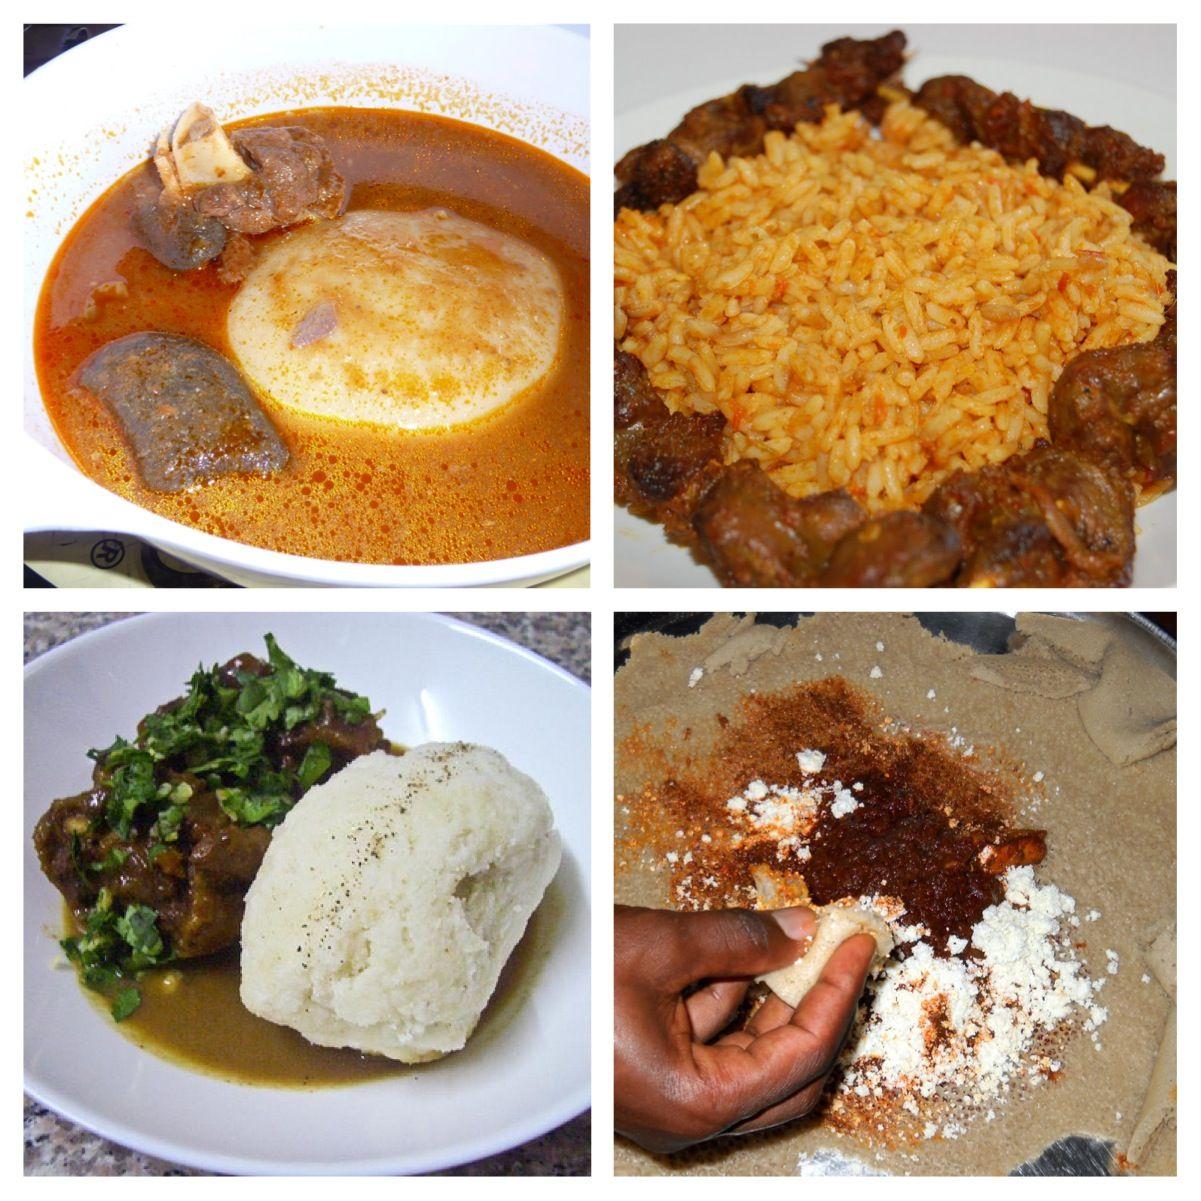 Who S Having African Food For Their Valentine S Dinner Which Do You Prefer Fufu Ugali Jollof Or Njera Ghana Nigeria Ghanaian Food Africa Food Kenyan Food